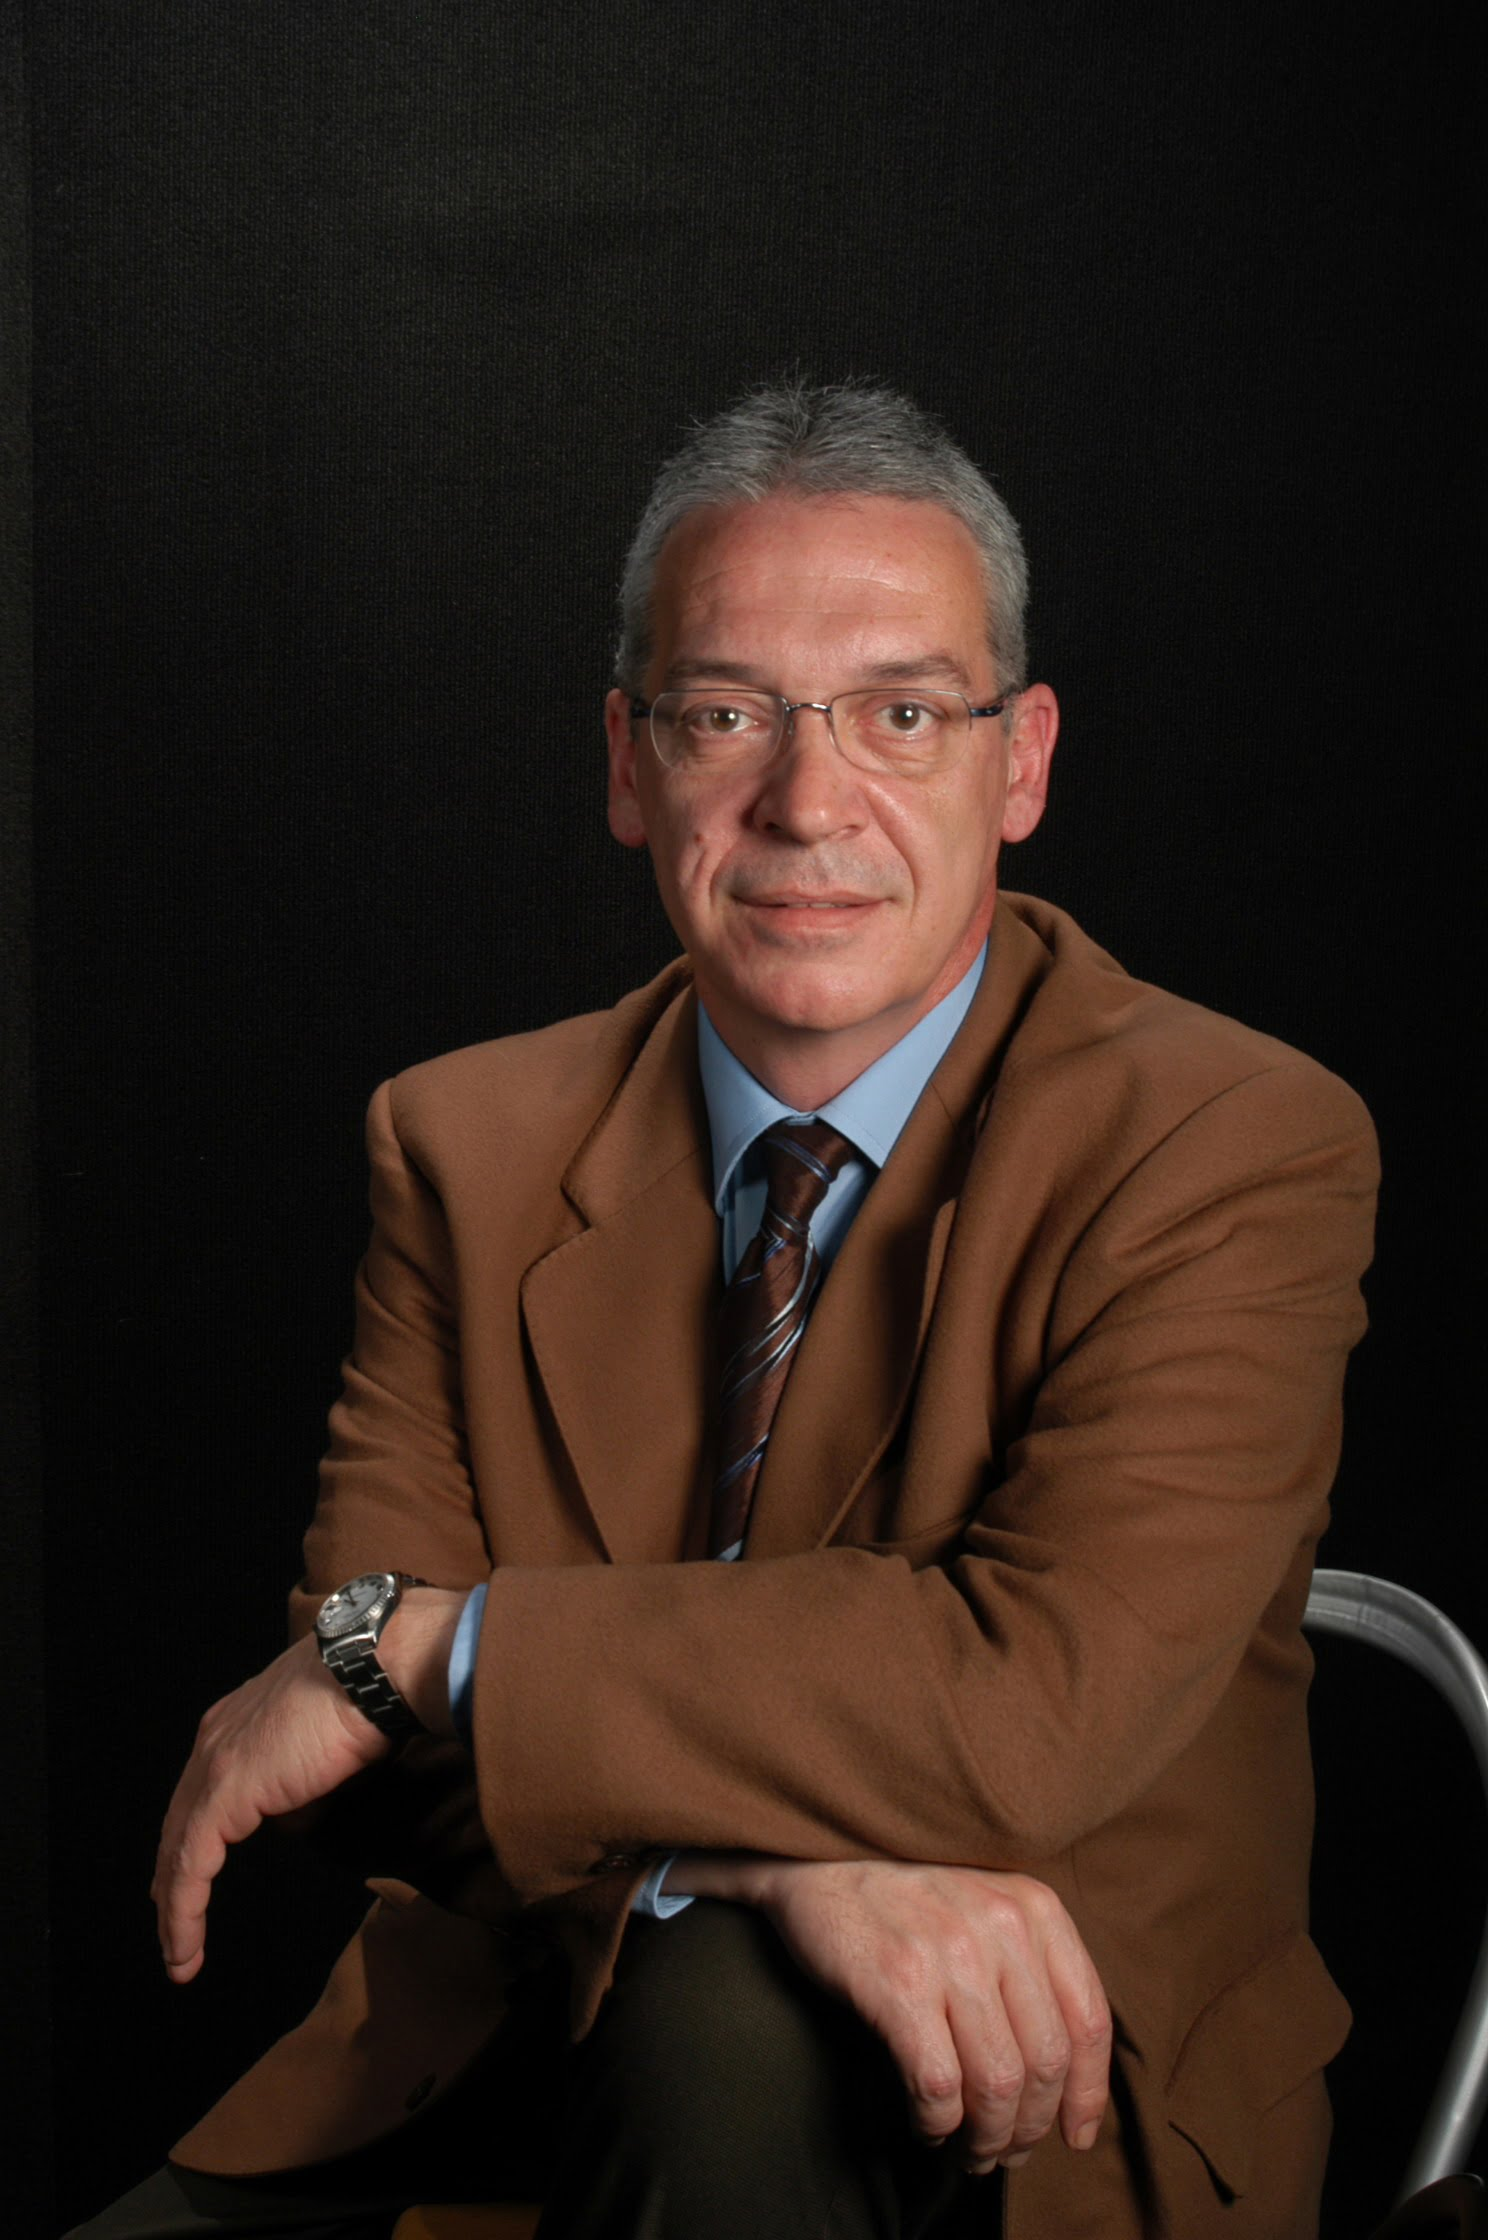 Dr. Joan Enric Latorre Ráez